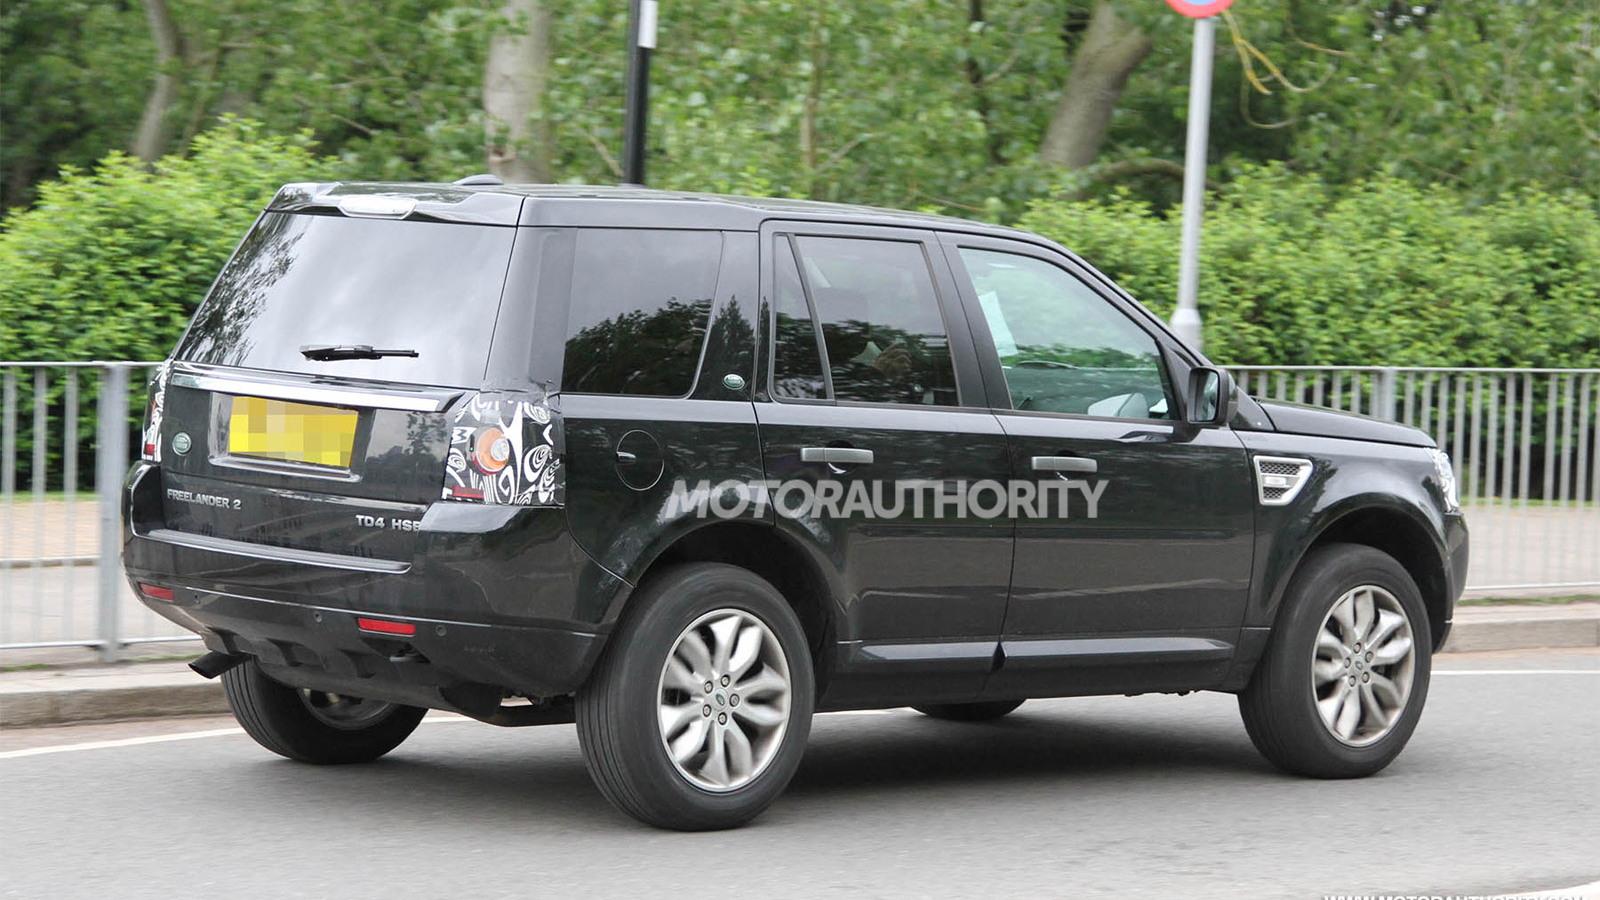 2013 Land Rover LR2 (Freelander) facelift spy shots